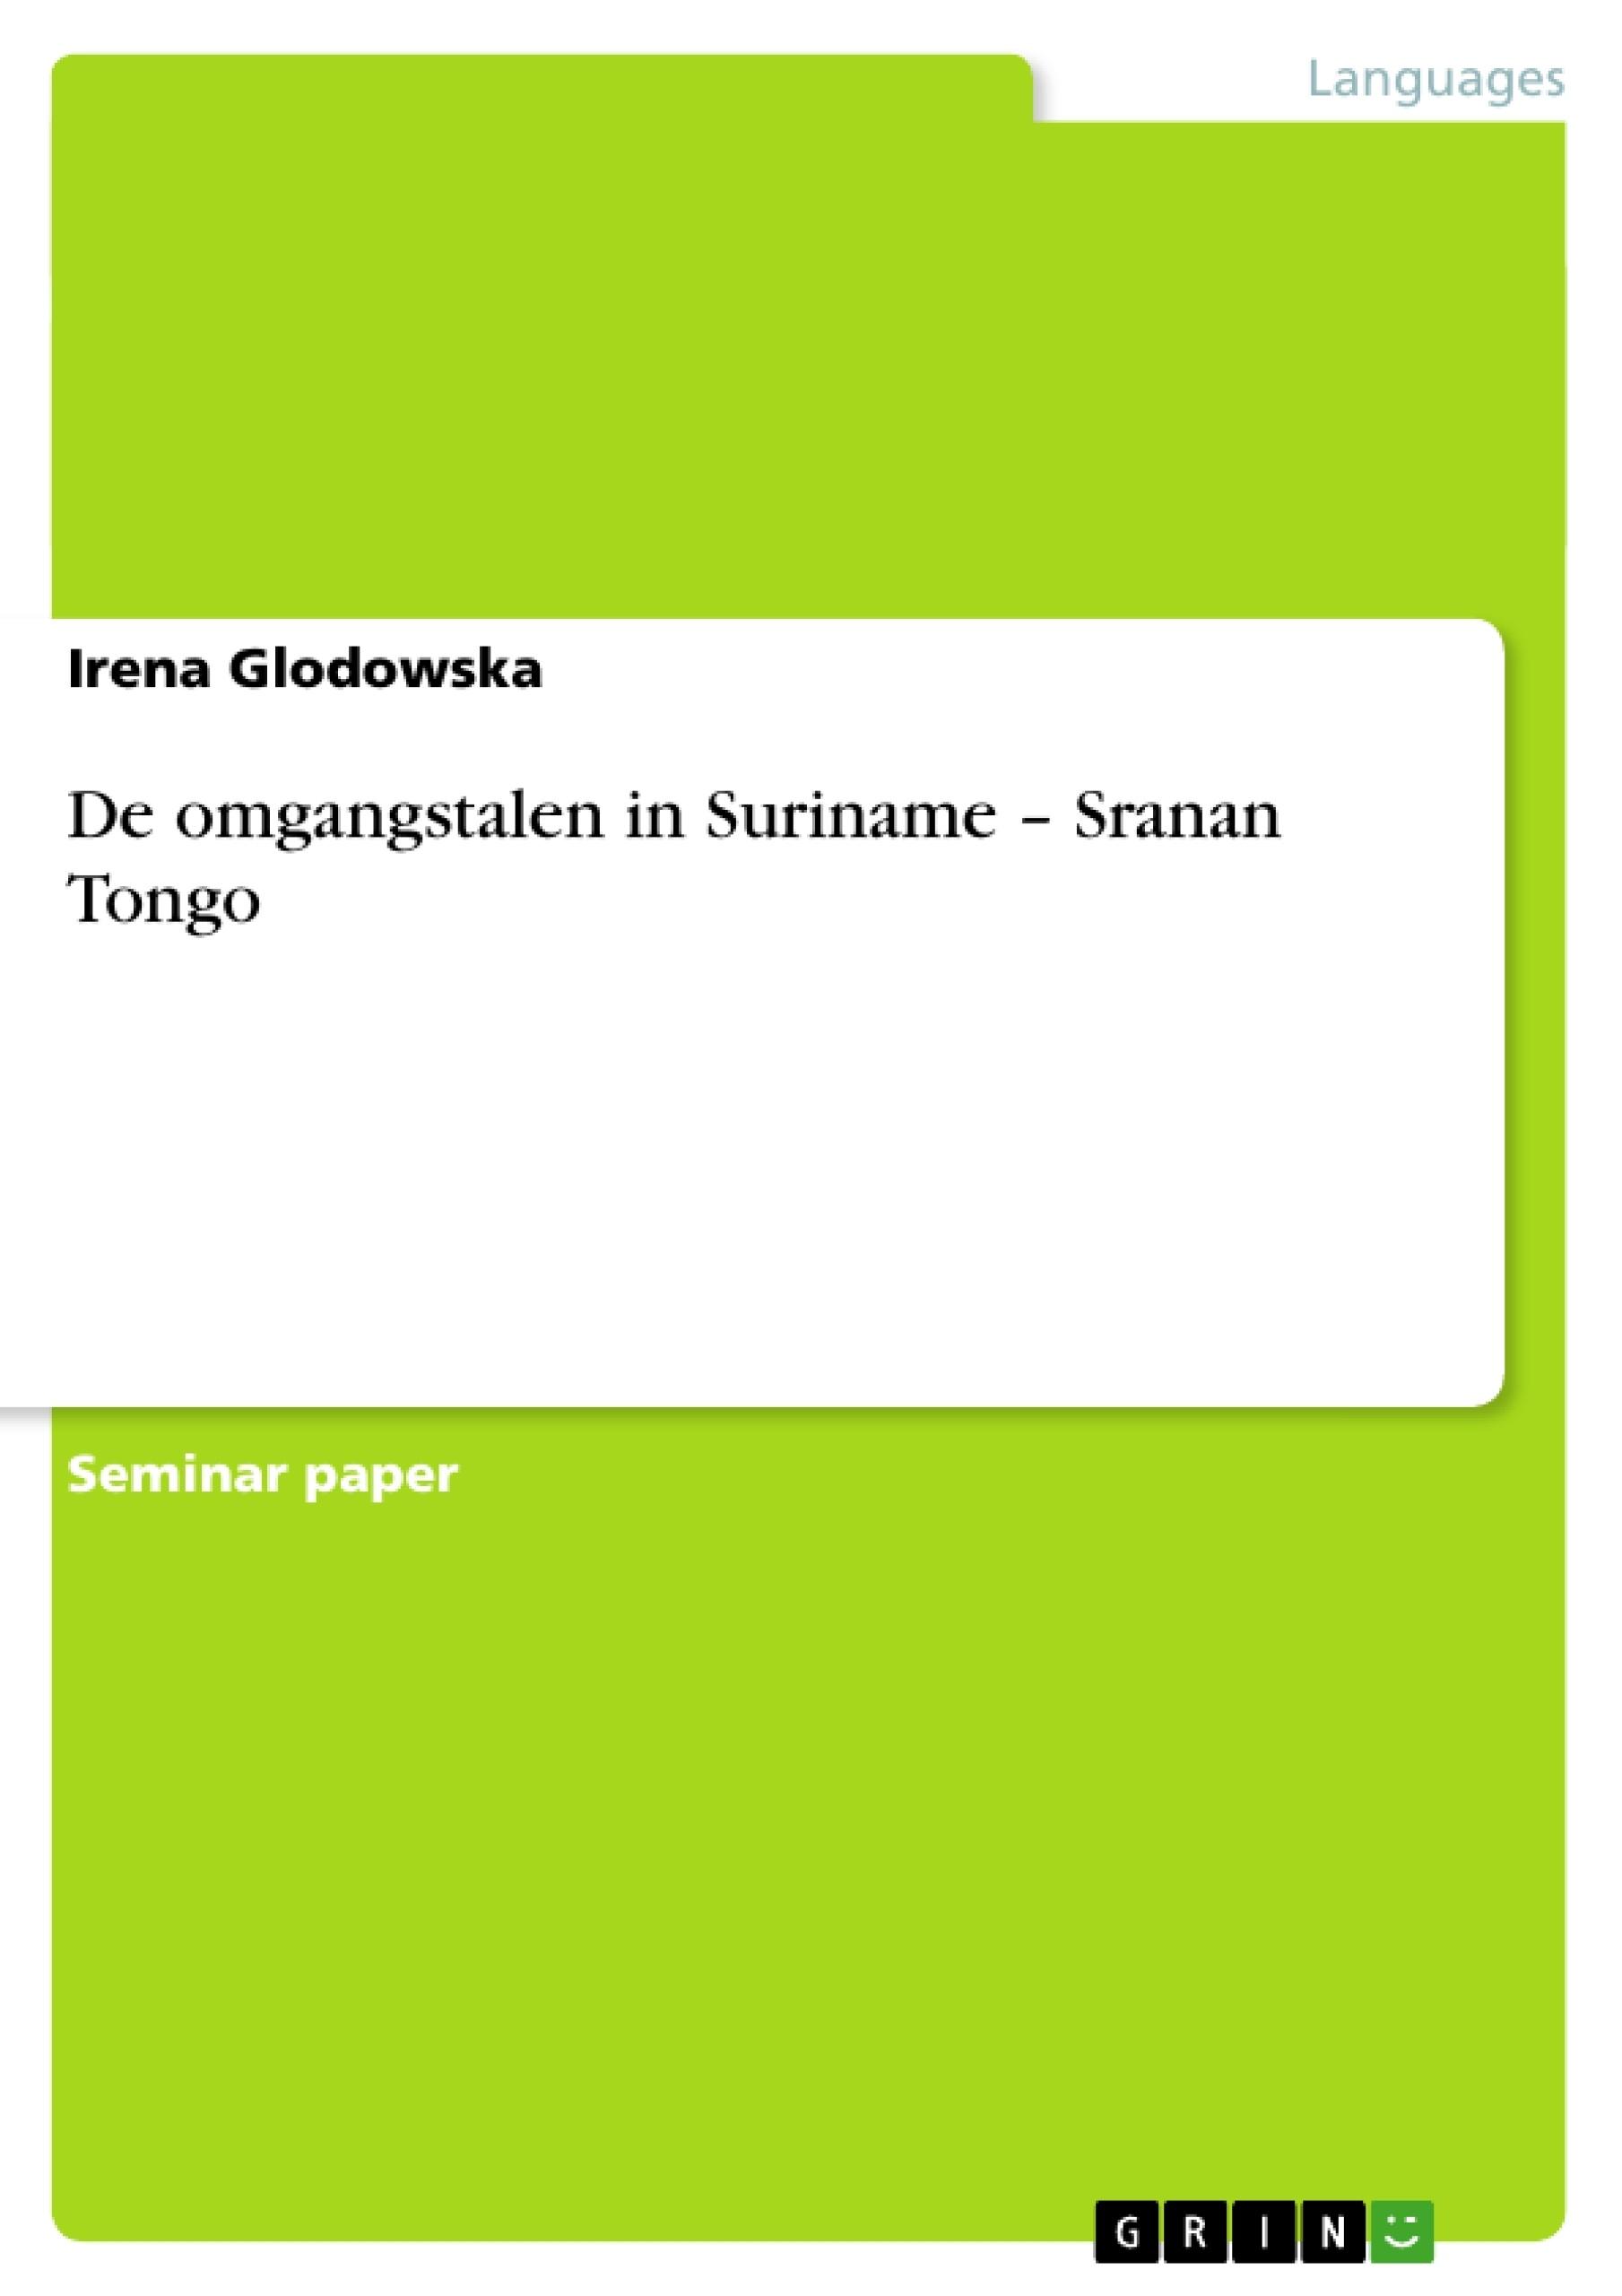 Title: De omgangstalen in Suriname – Sranan Tongo